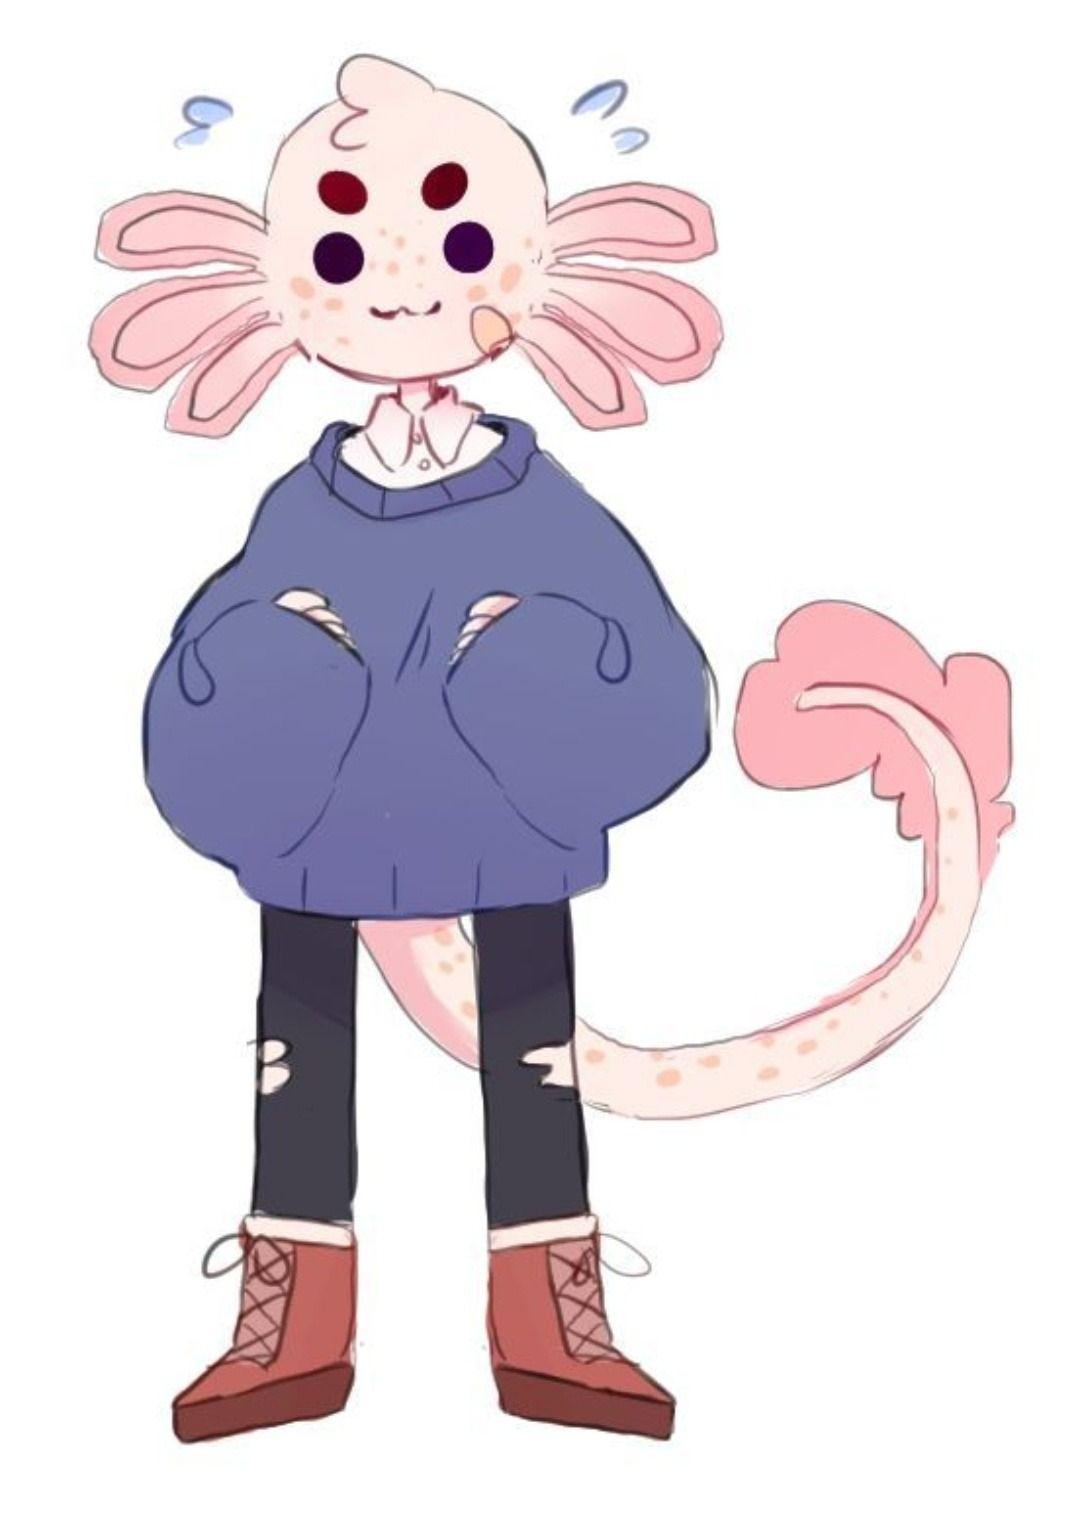 I Made An Axolotl Character 0 Furry Art Cartoon Art Styles Cute Art